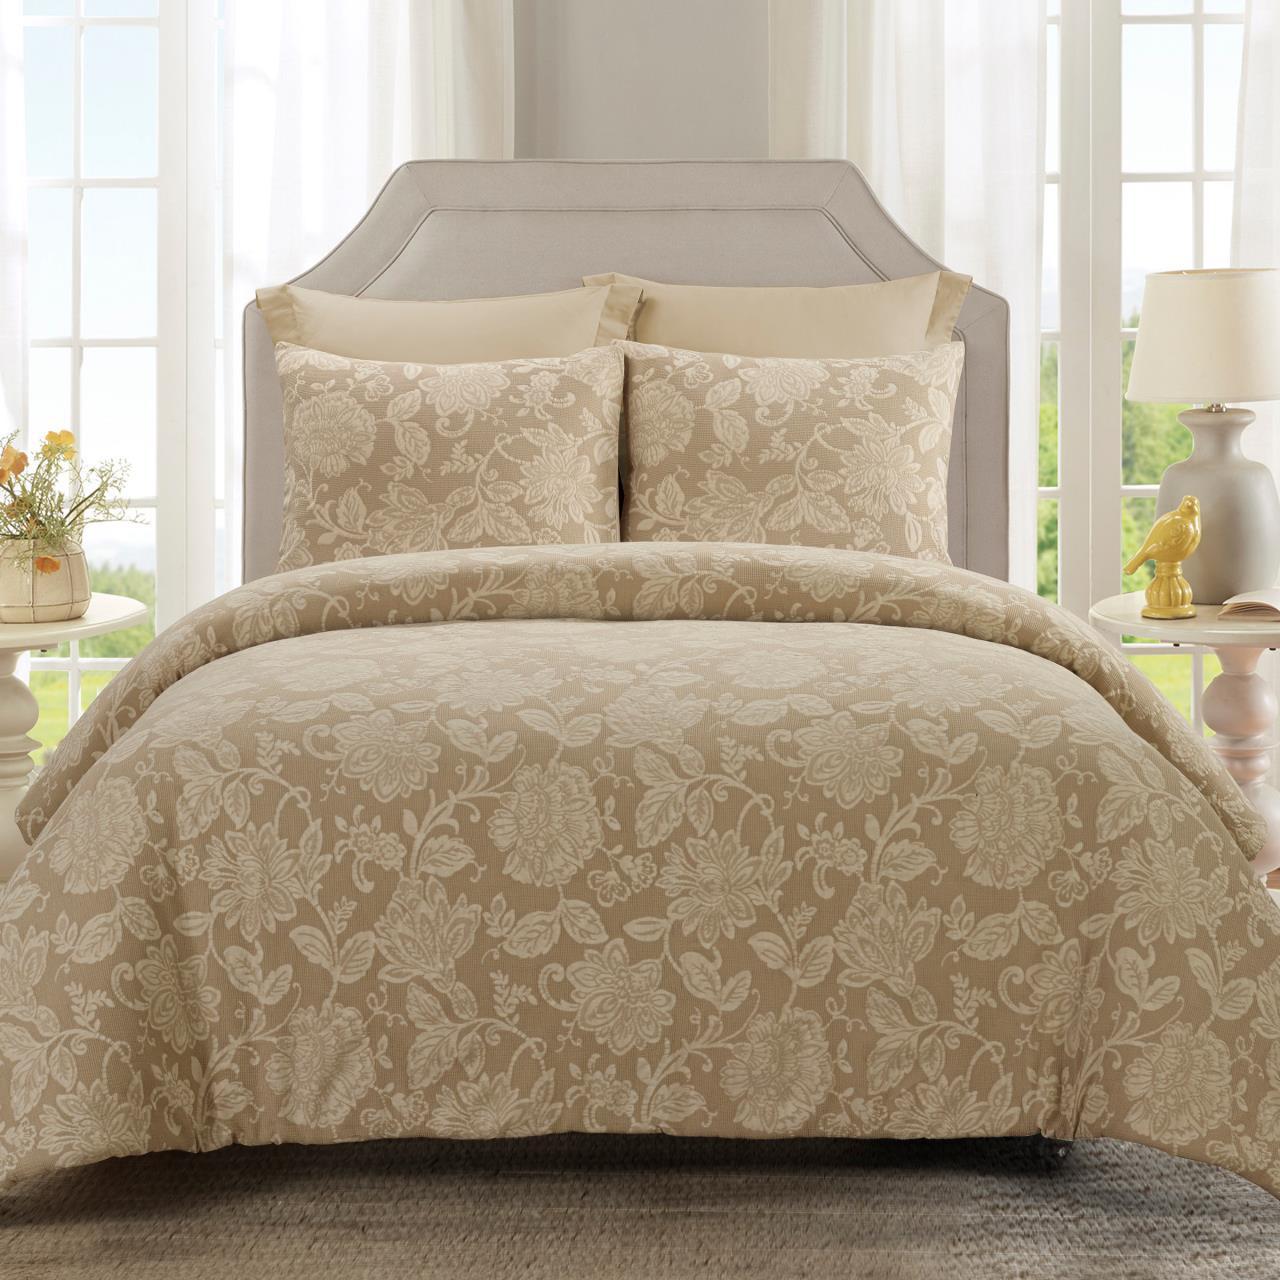 Amadora Cappuccino Comforter Set - 754069006533